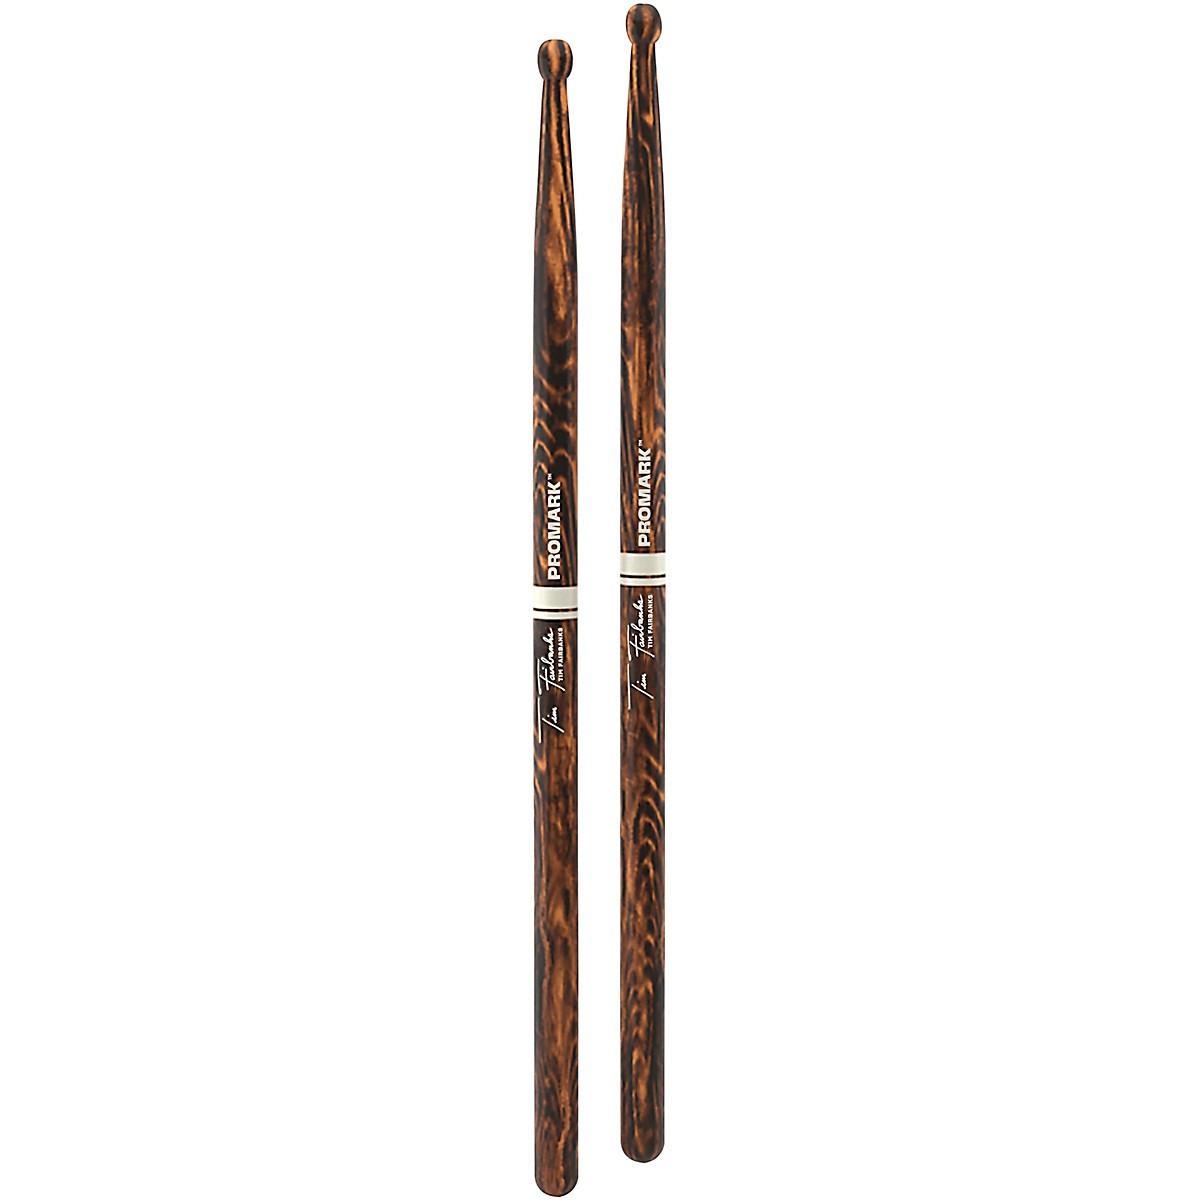 Promark Tim Fairbanks FireGrain Marching Snare Stick